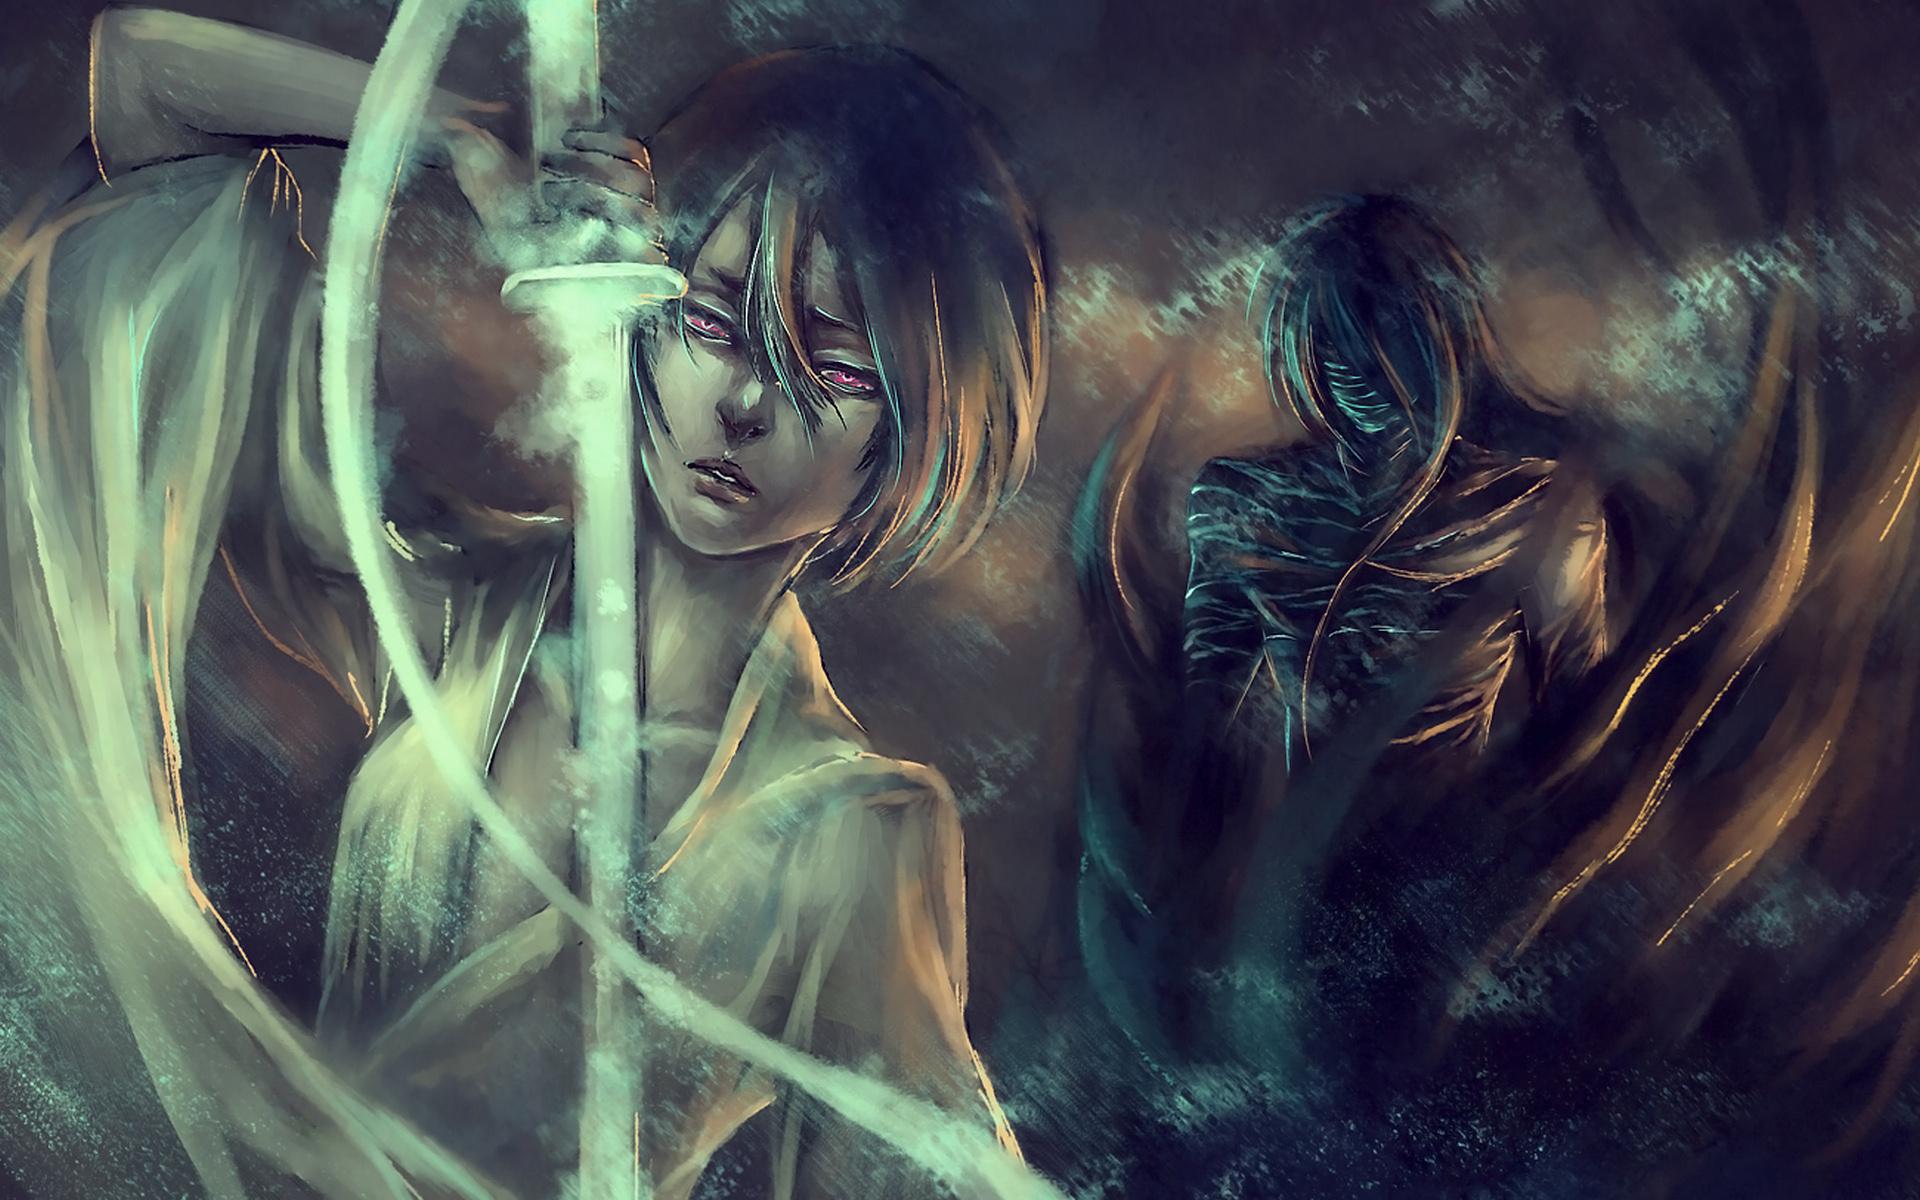 Image: Girl, Rukia Kuchiki, sword, guy, anime, art, Bleach